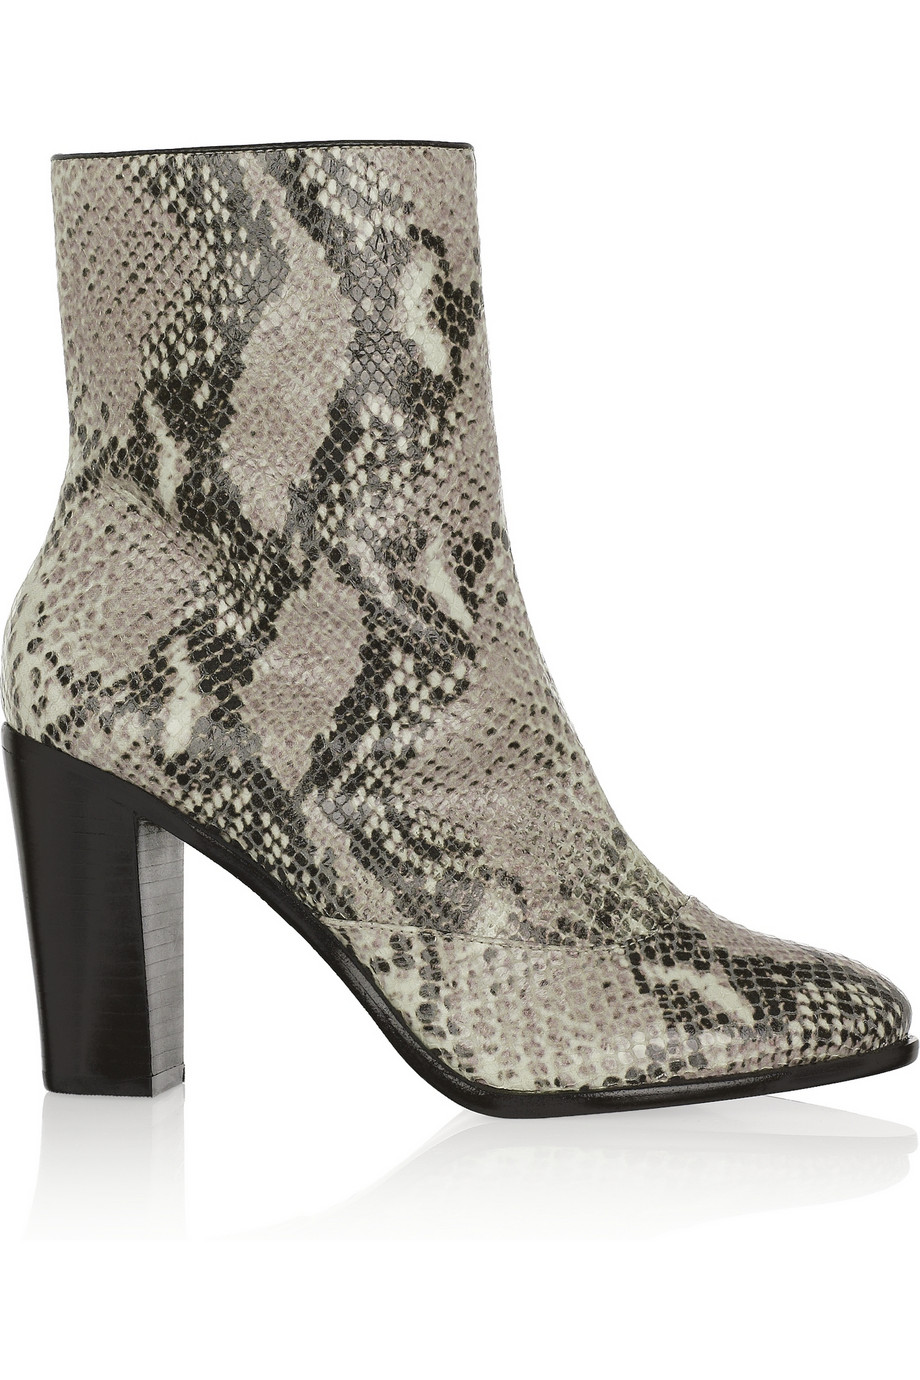 Lyst Pour La Victoire Snakeskin Effect Leather Ankle Boots